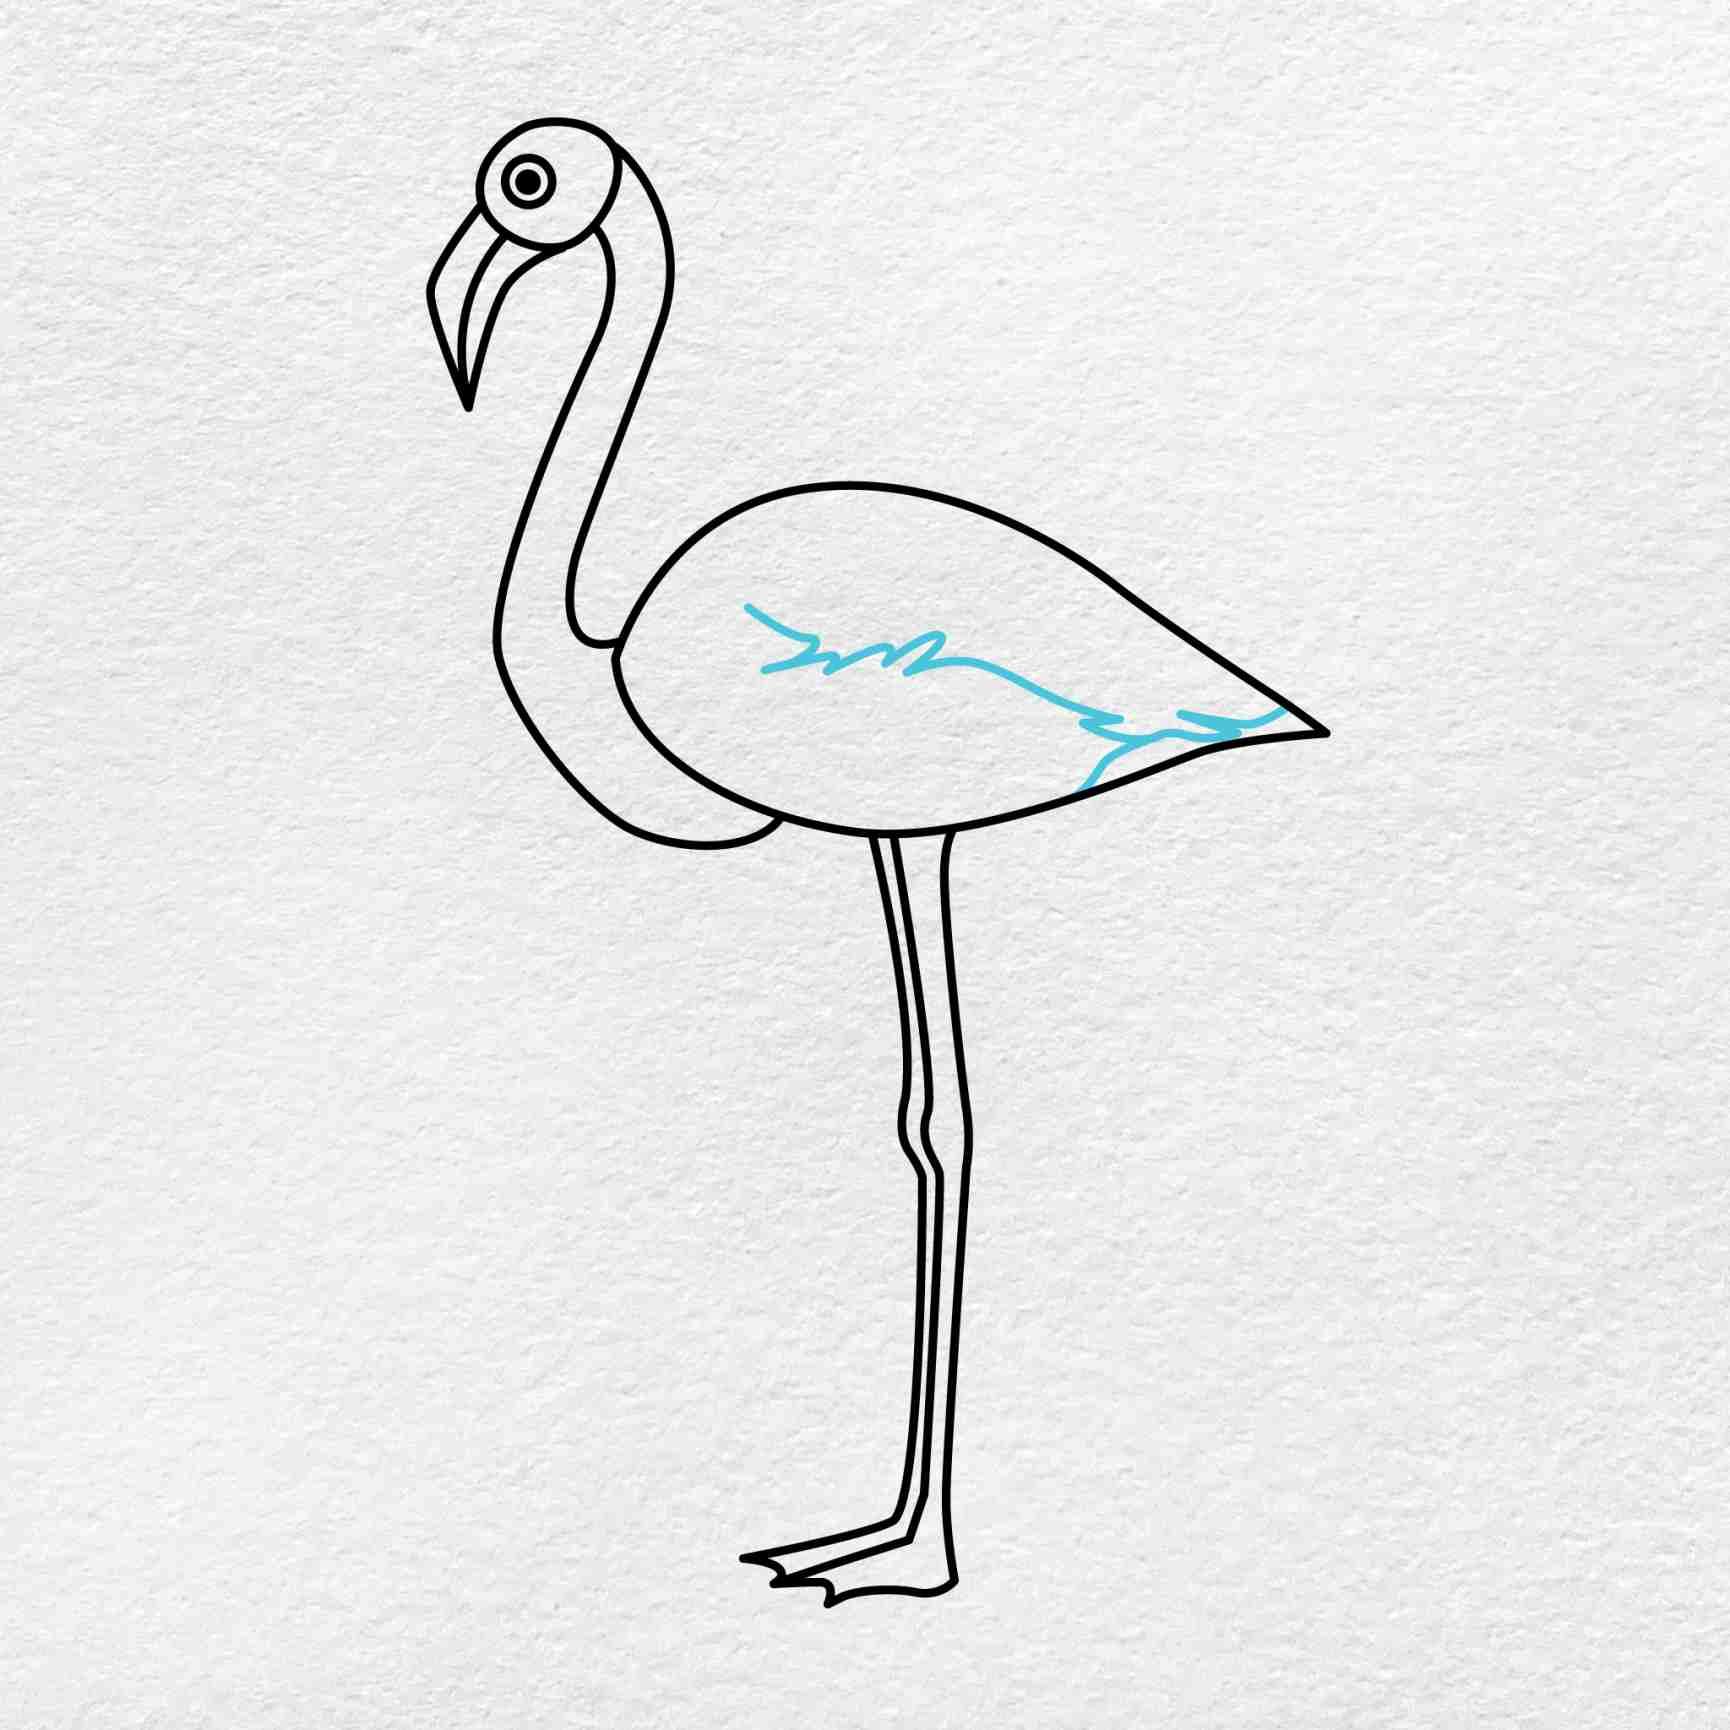 Flamingo Drawing: Step 5